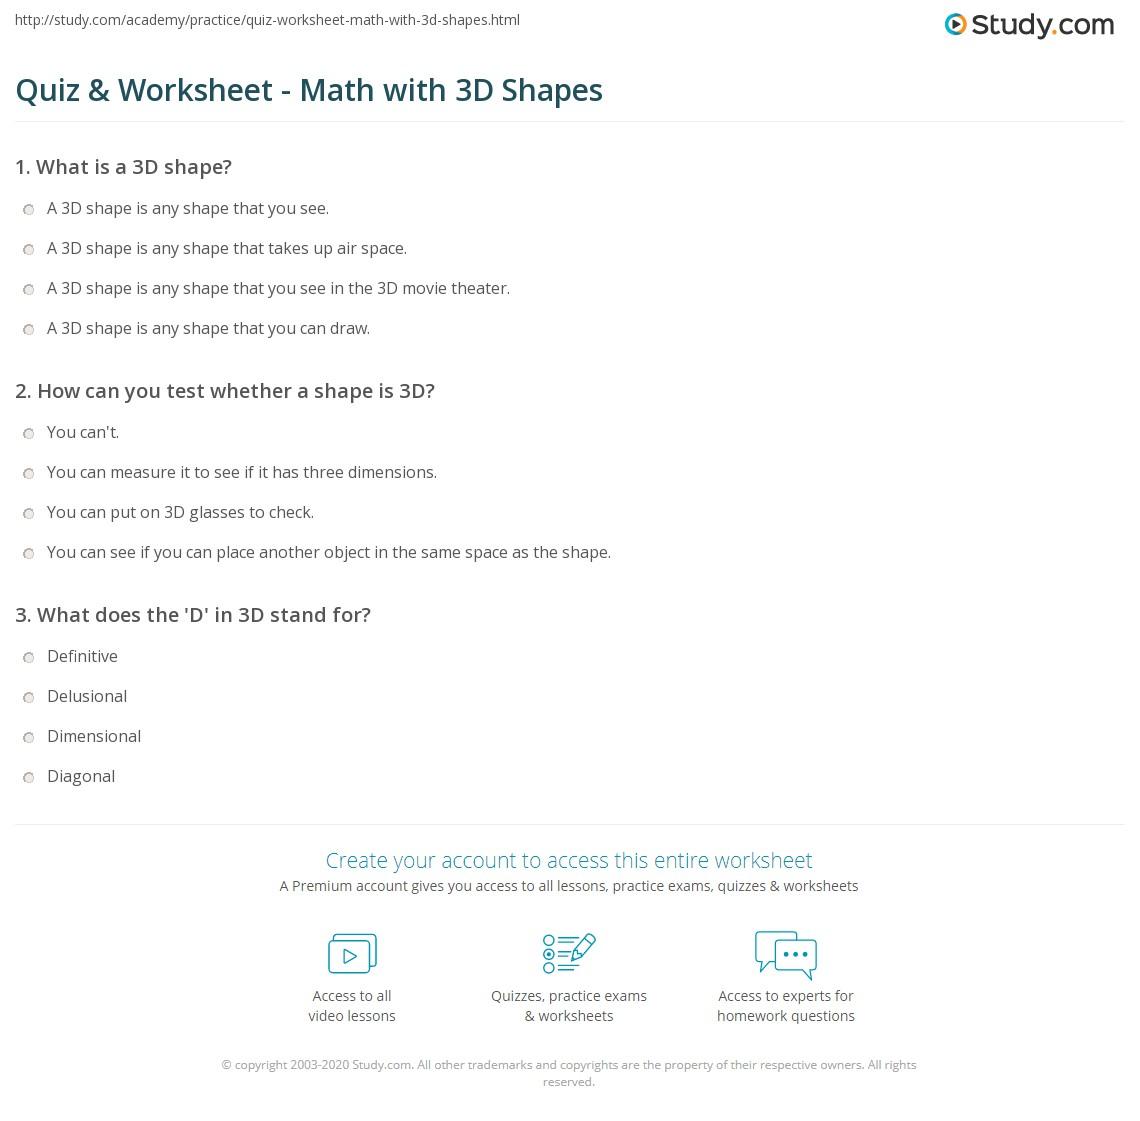 Quiz & Worksheet - Math with 3D Shapes | Study.com